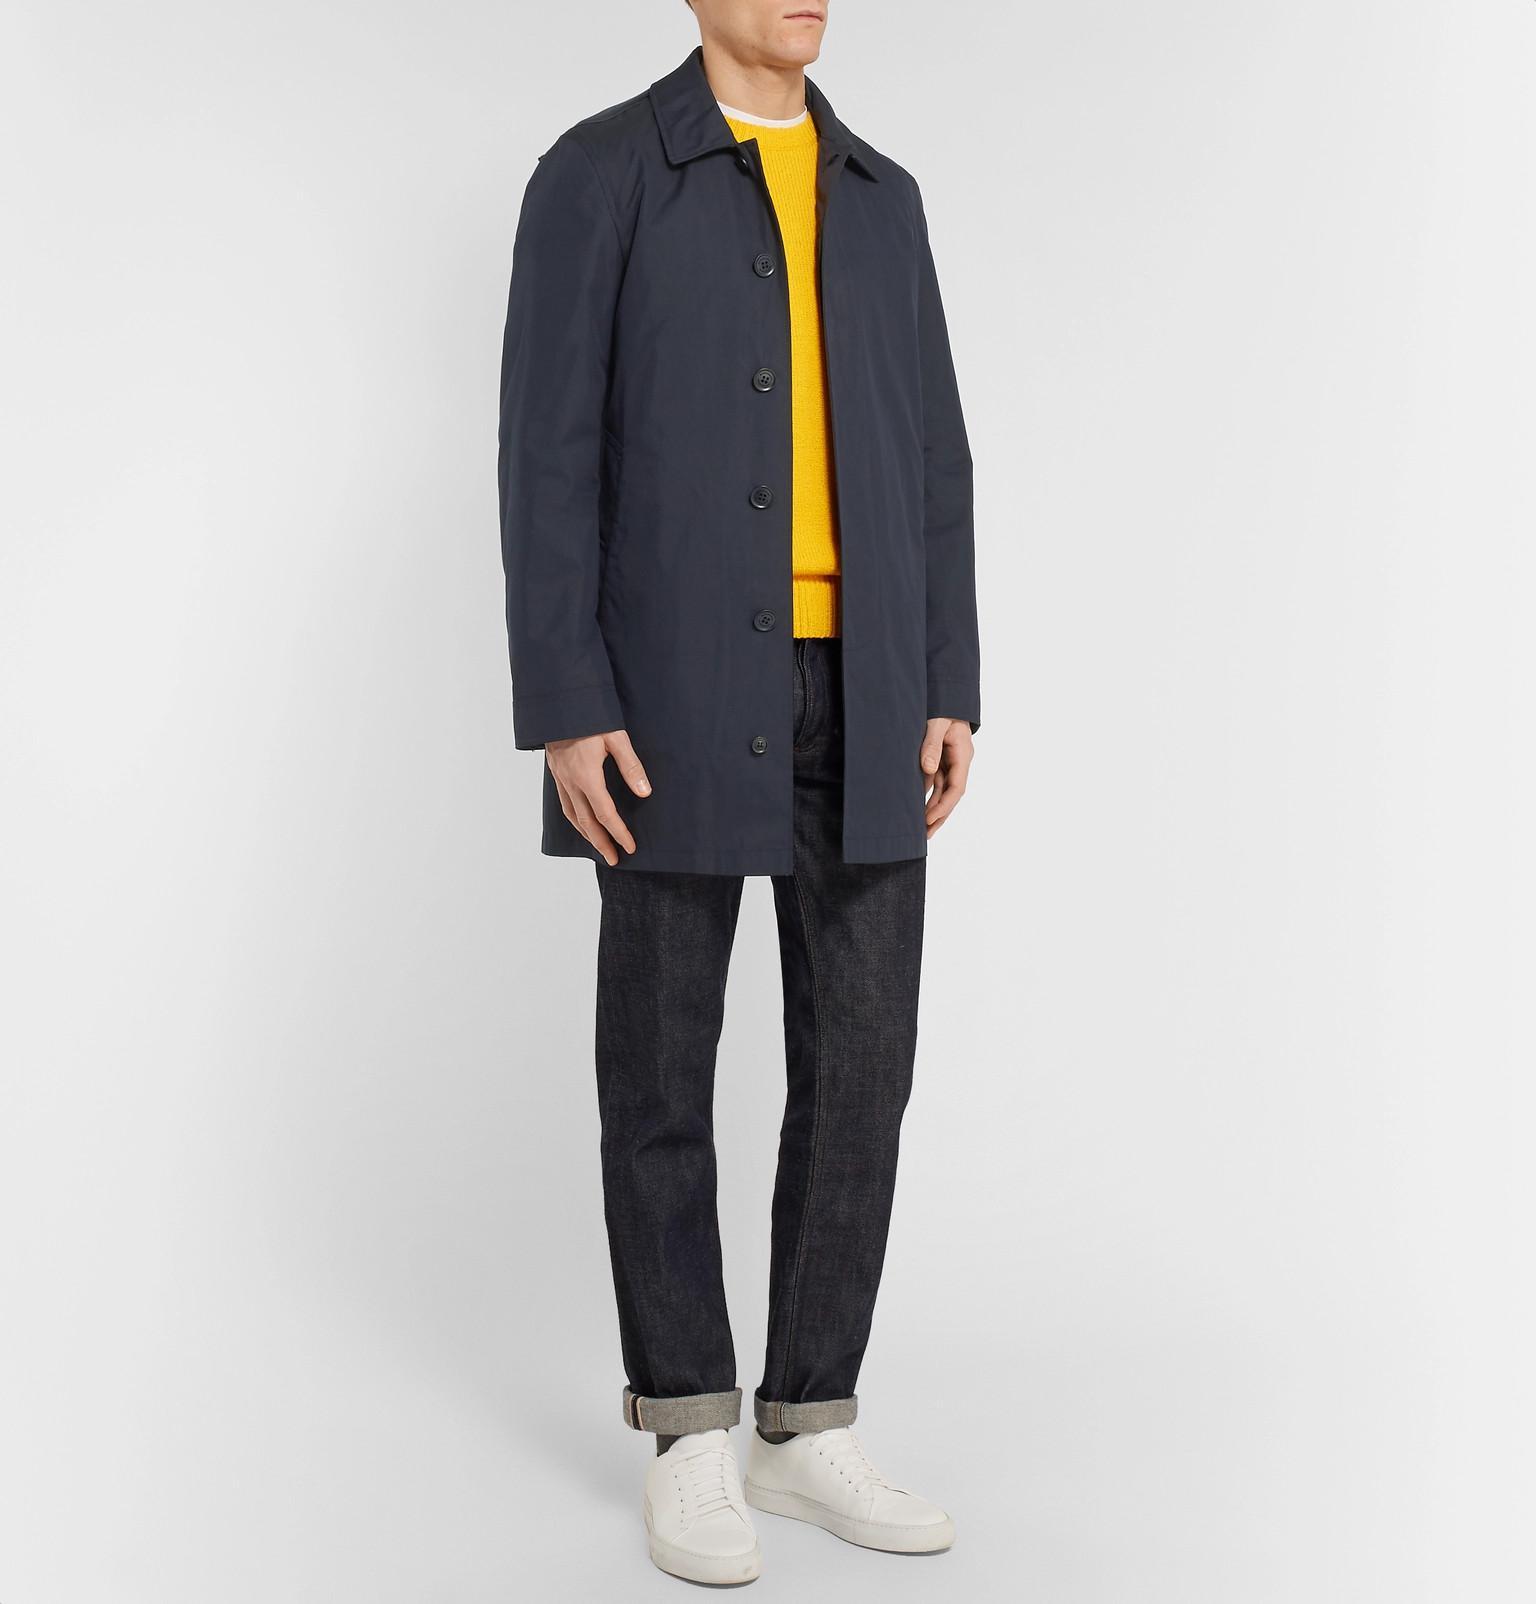 Lyst Blue Coat For Gilet With Hooded Detachable View Blend Cotton Fullscreen Men Burberry Gabardine PqUqC